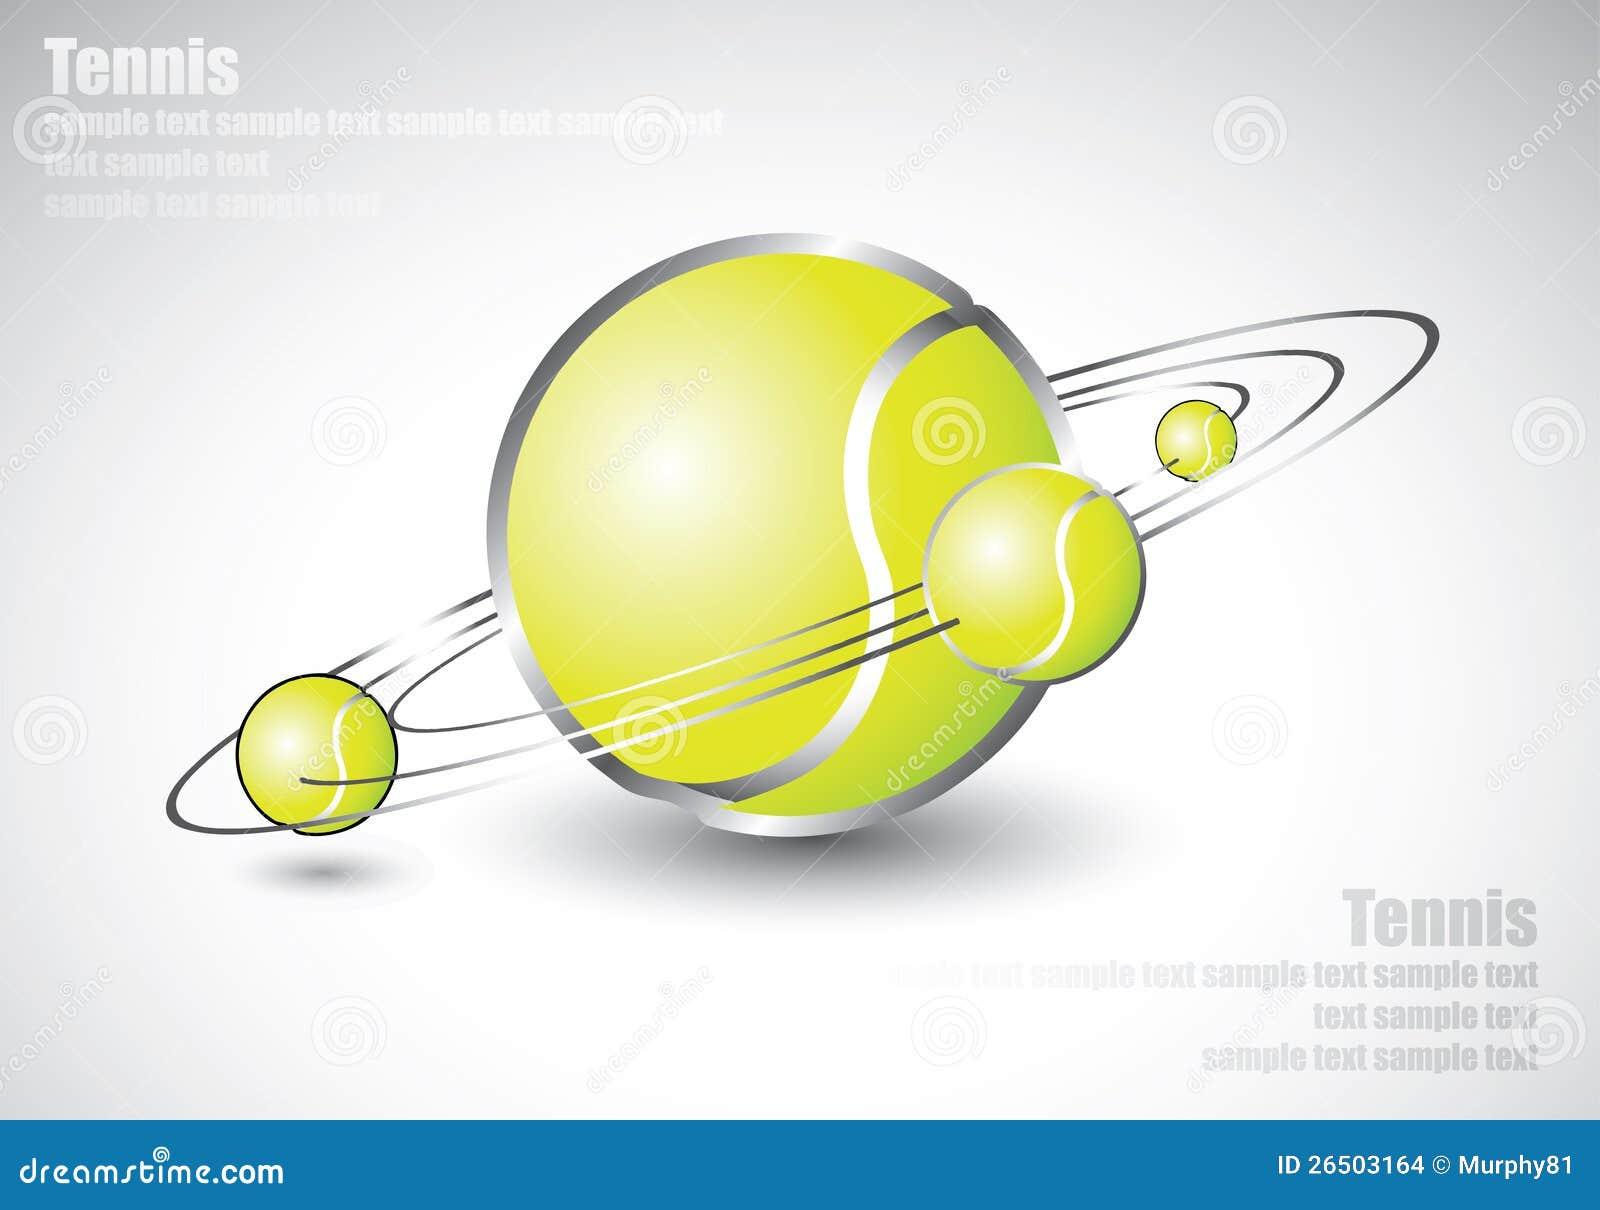 As esferas de tênis deram forma como o sistema solar